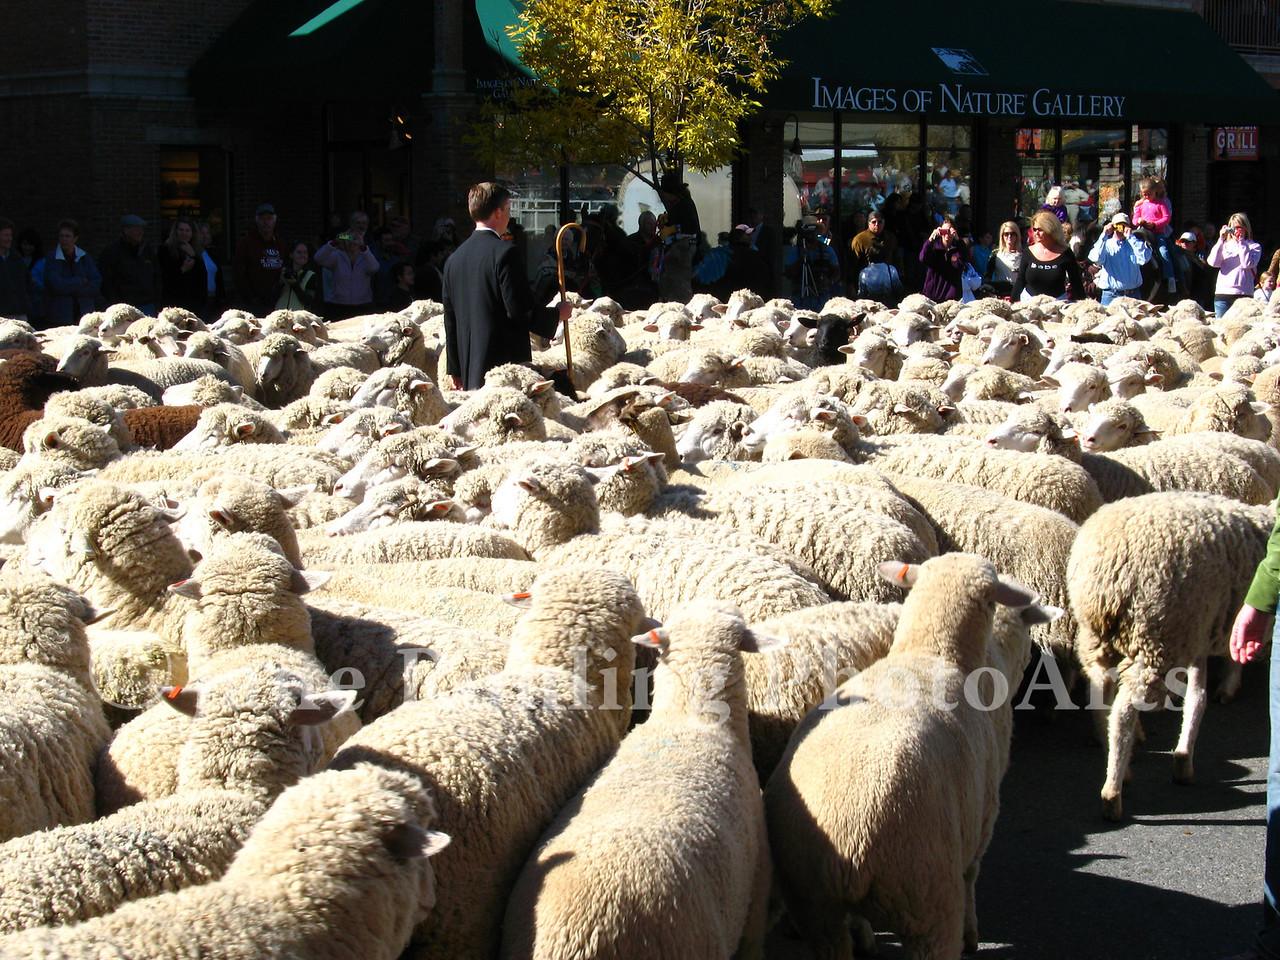 A Catholic priest gives the traditional blessing of the sheep during the Trailing of the Sheep Festival parade, Ketchum, Idaho.